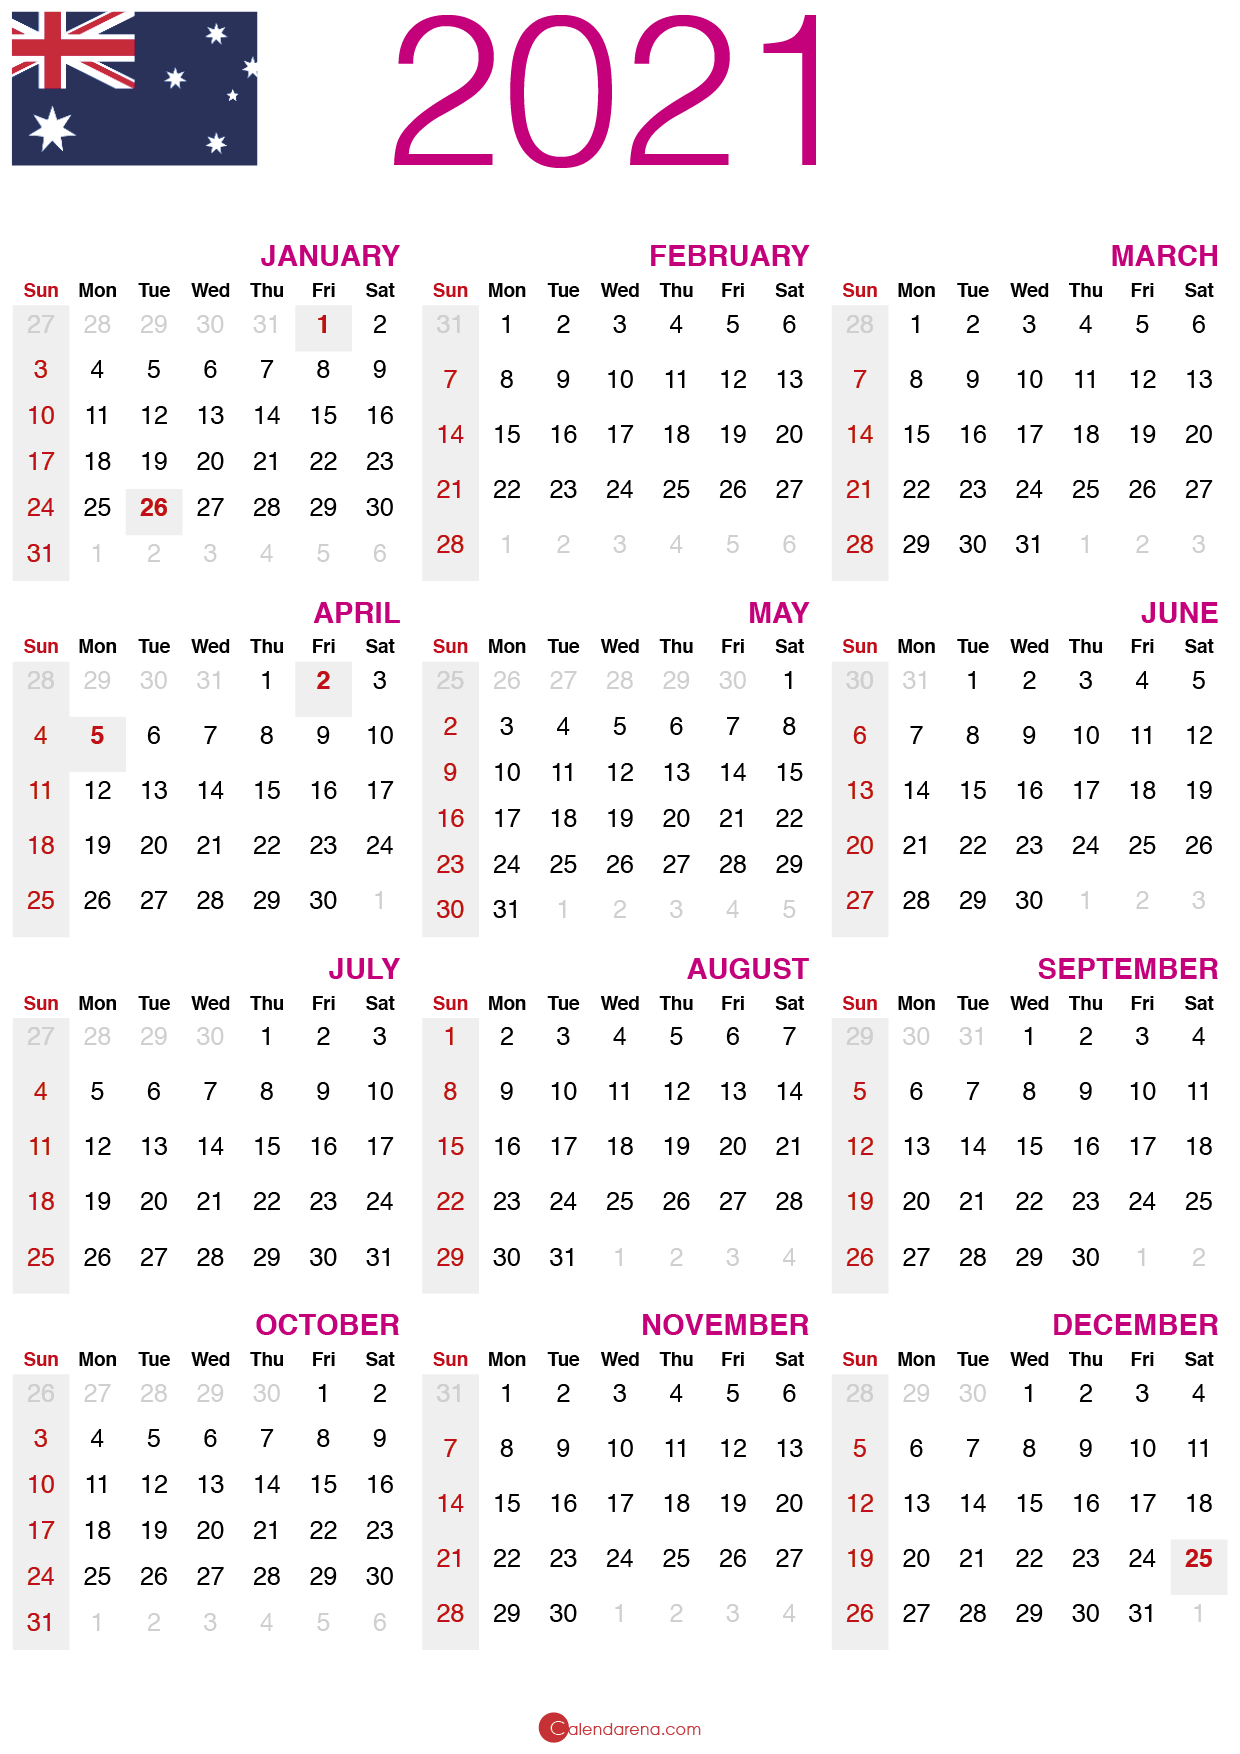 Download Free 2021 Calendar Australia